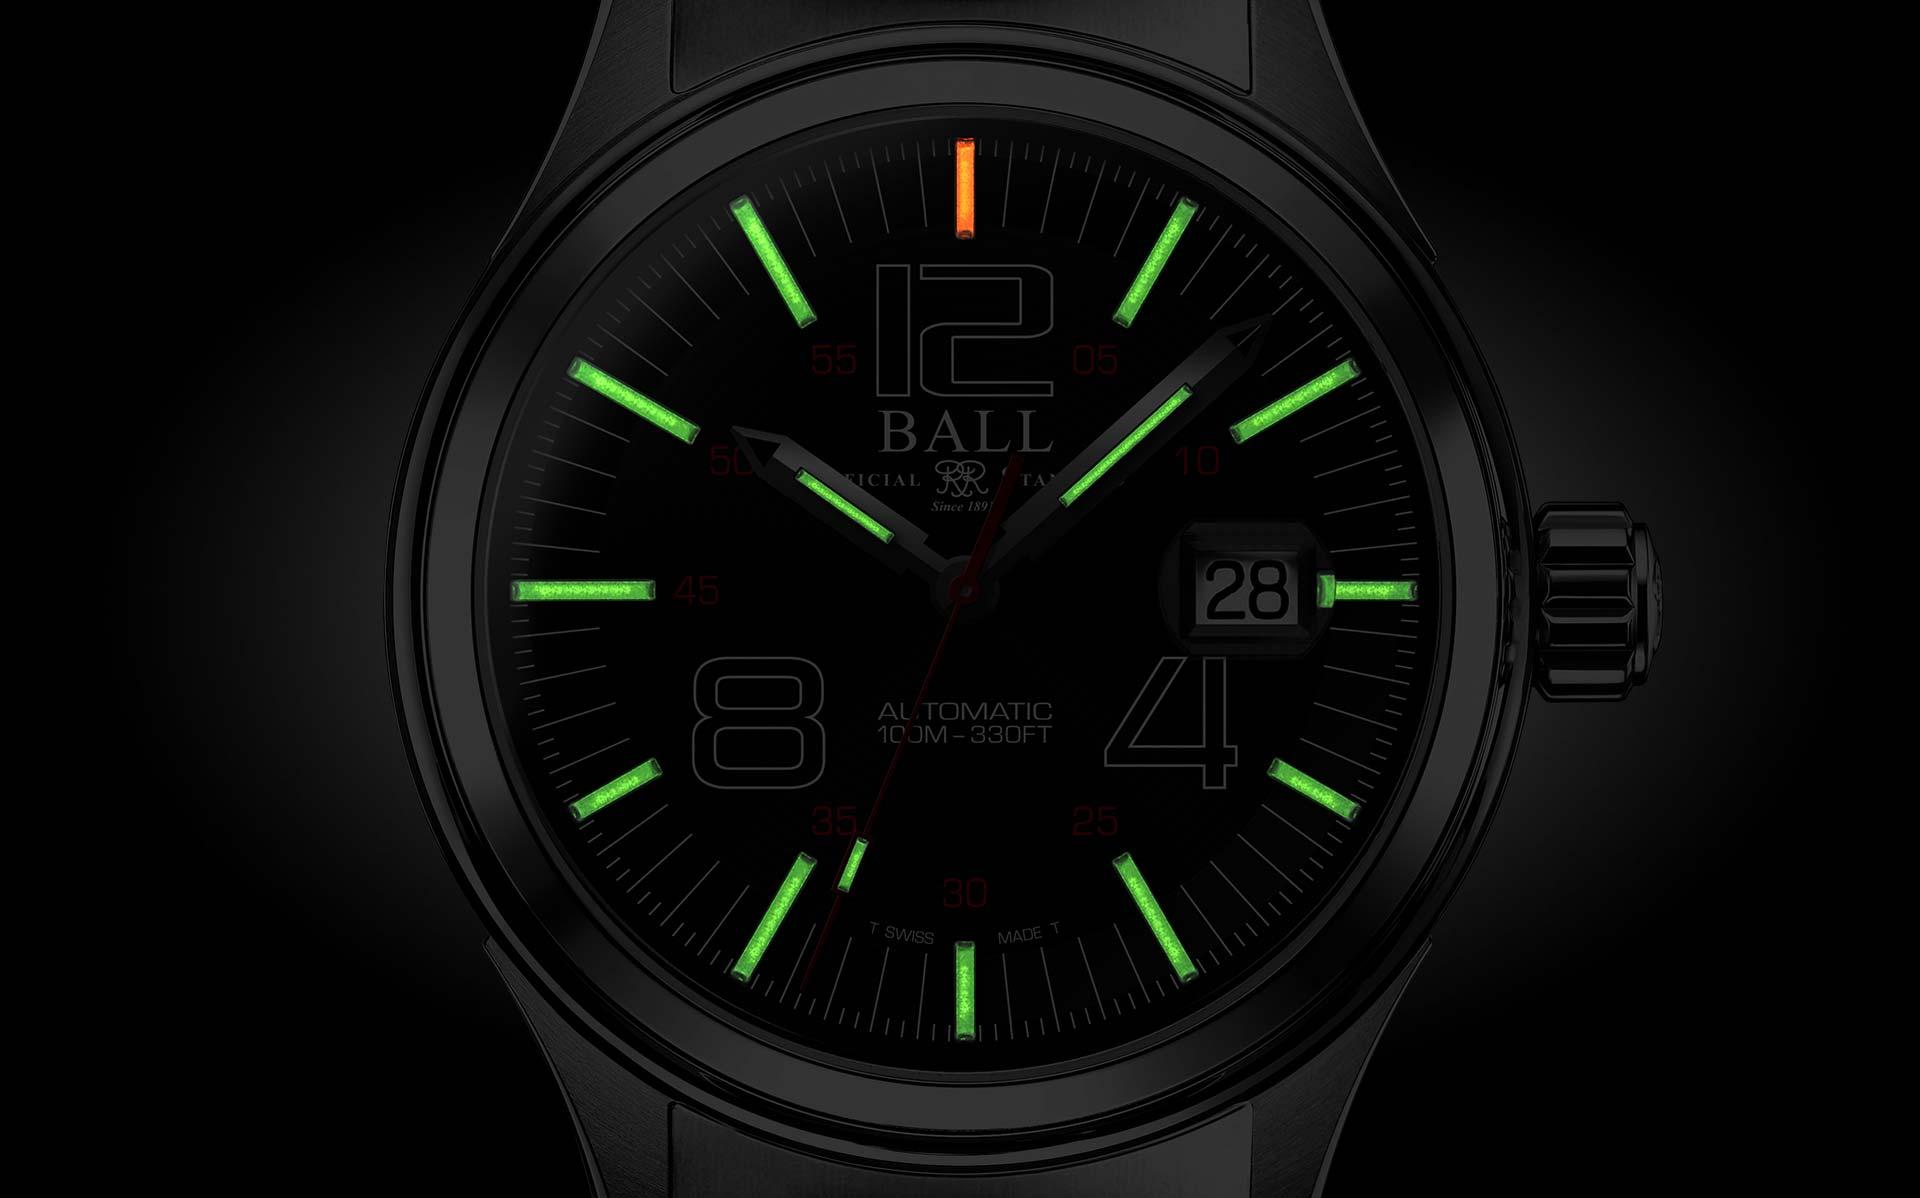 ball-fireman-nightbreaker-3.jpg